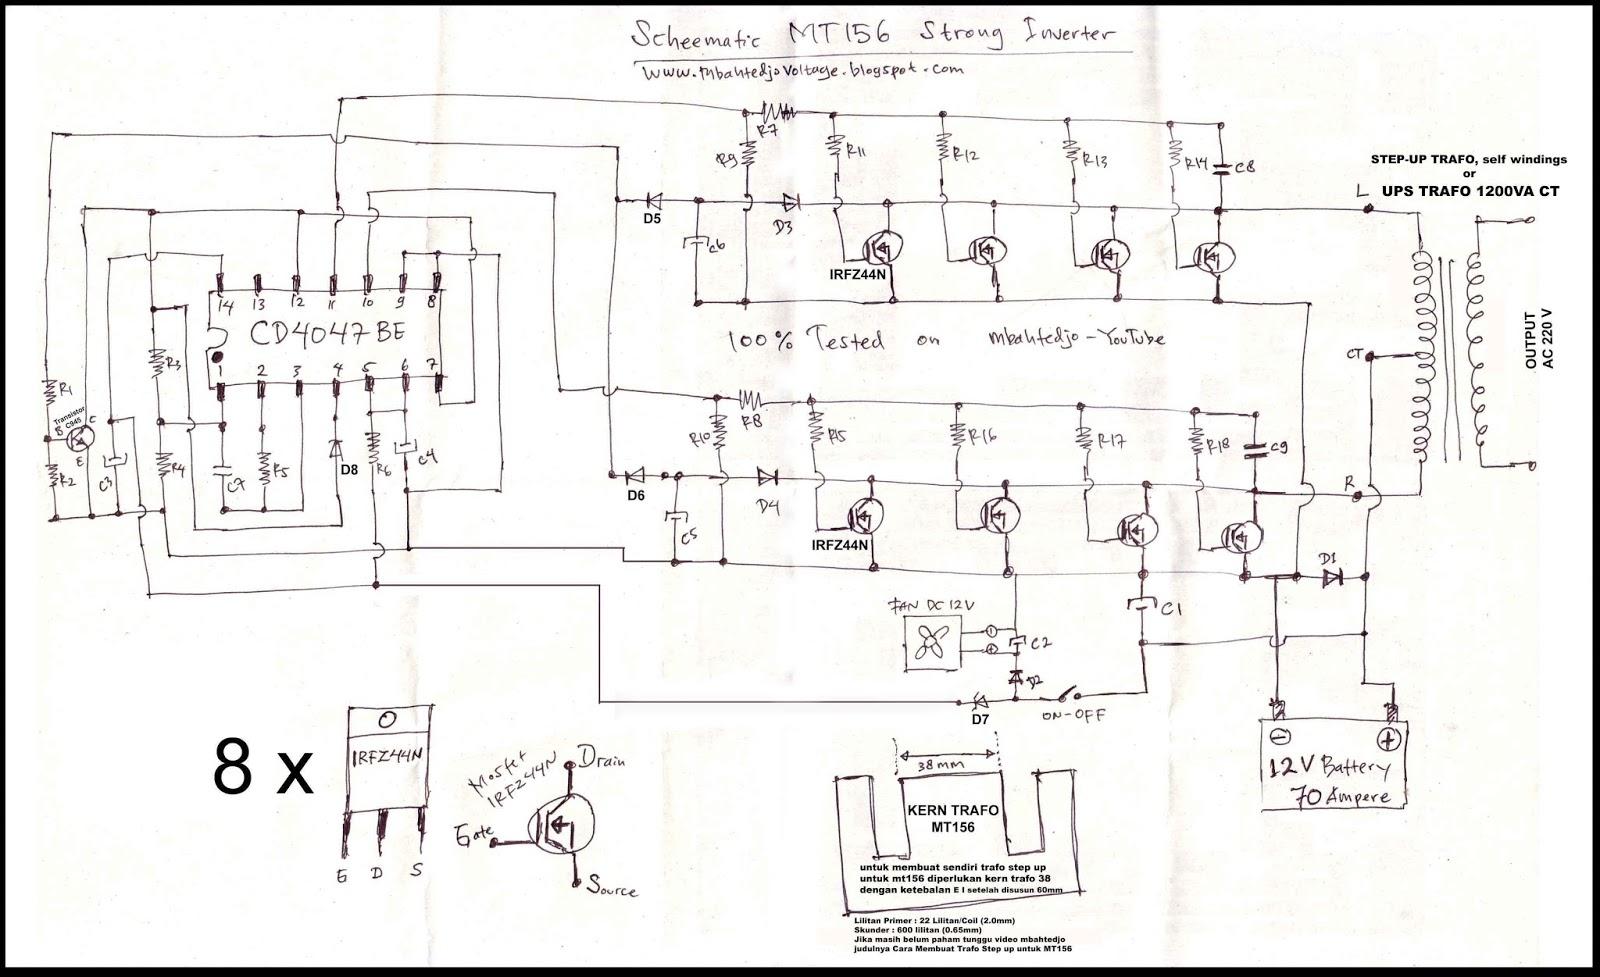 mbahtedjo voltage  STRONG    INVERTER    MT156  Scheematic